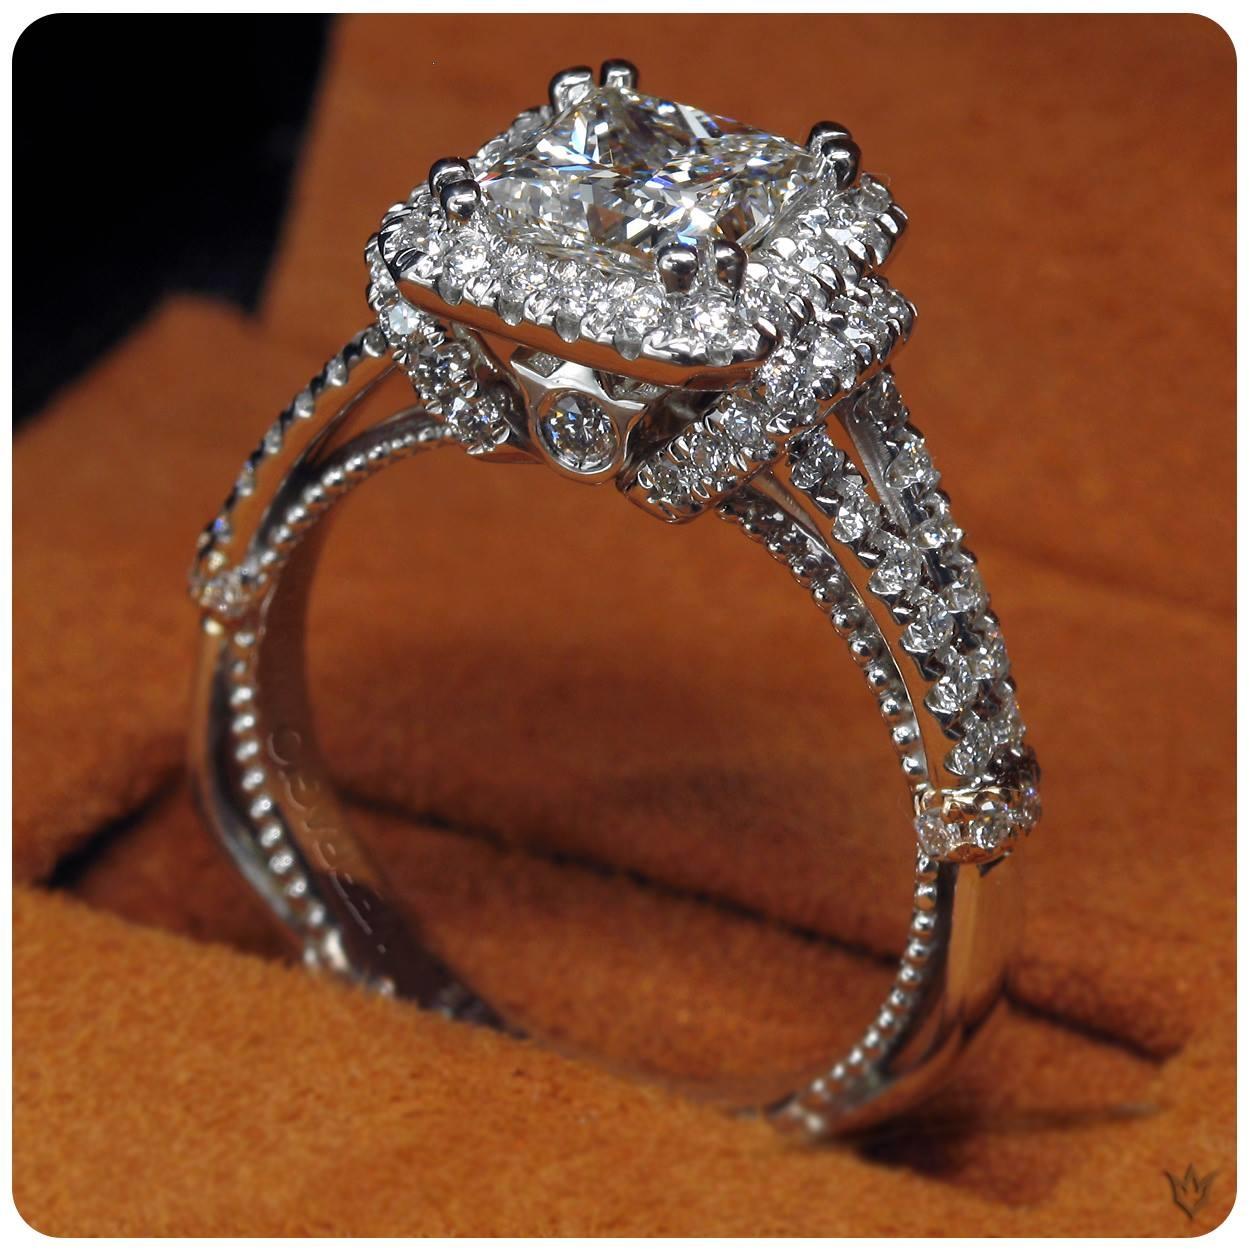 Emerald Lady Jewelry image 17